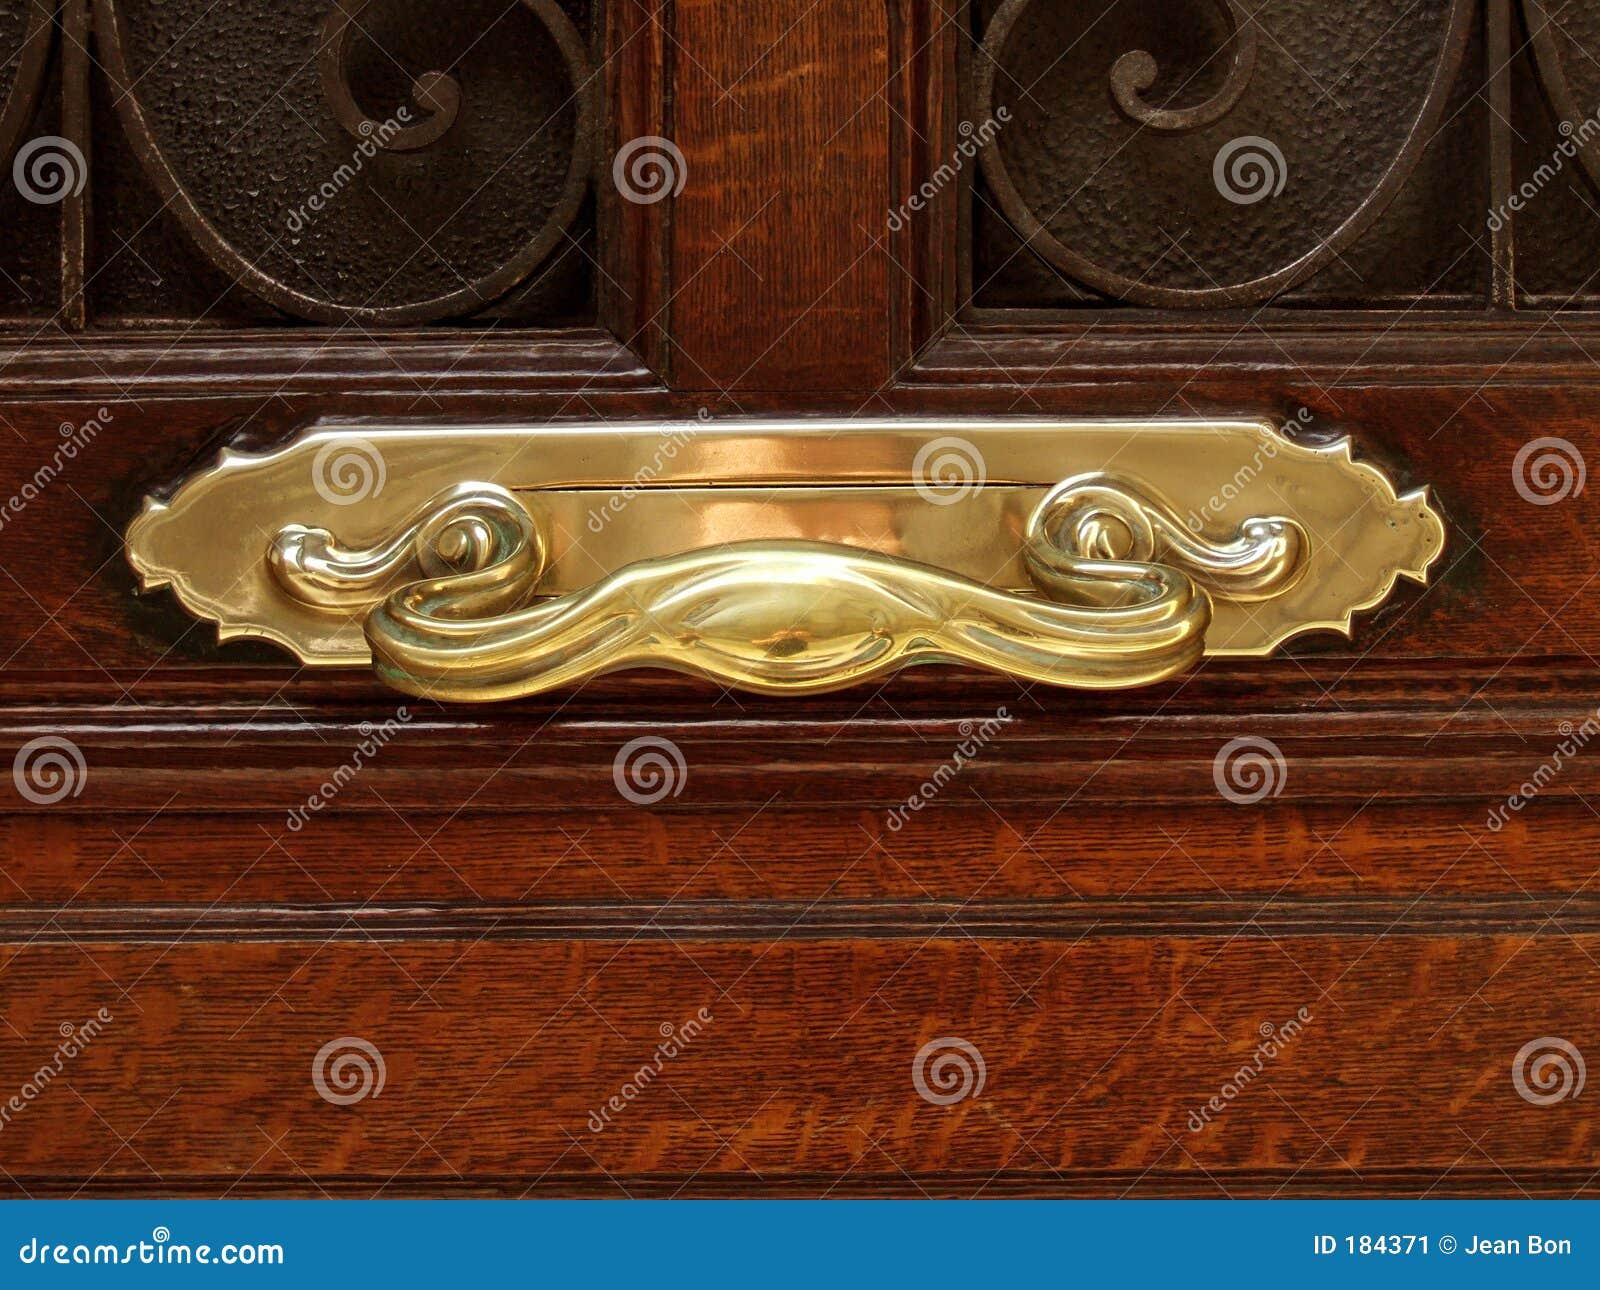 Maneta de puerta de oro